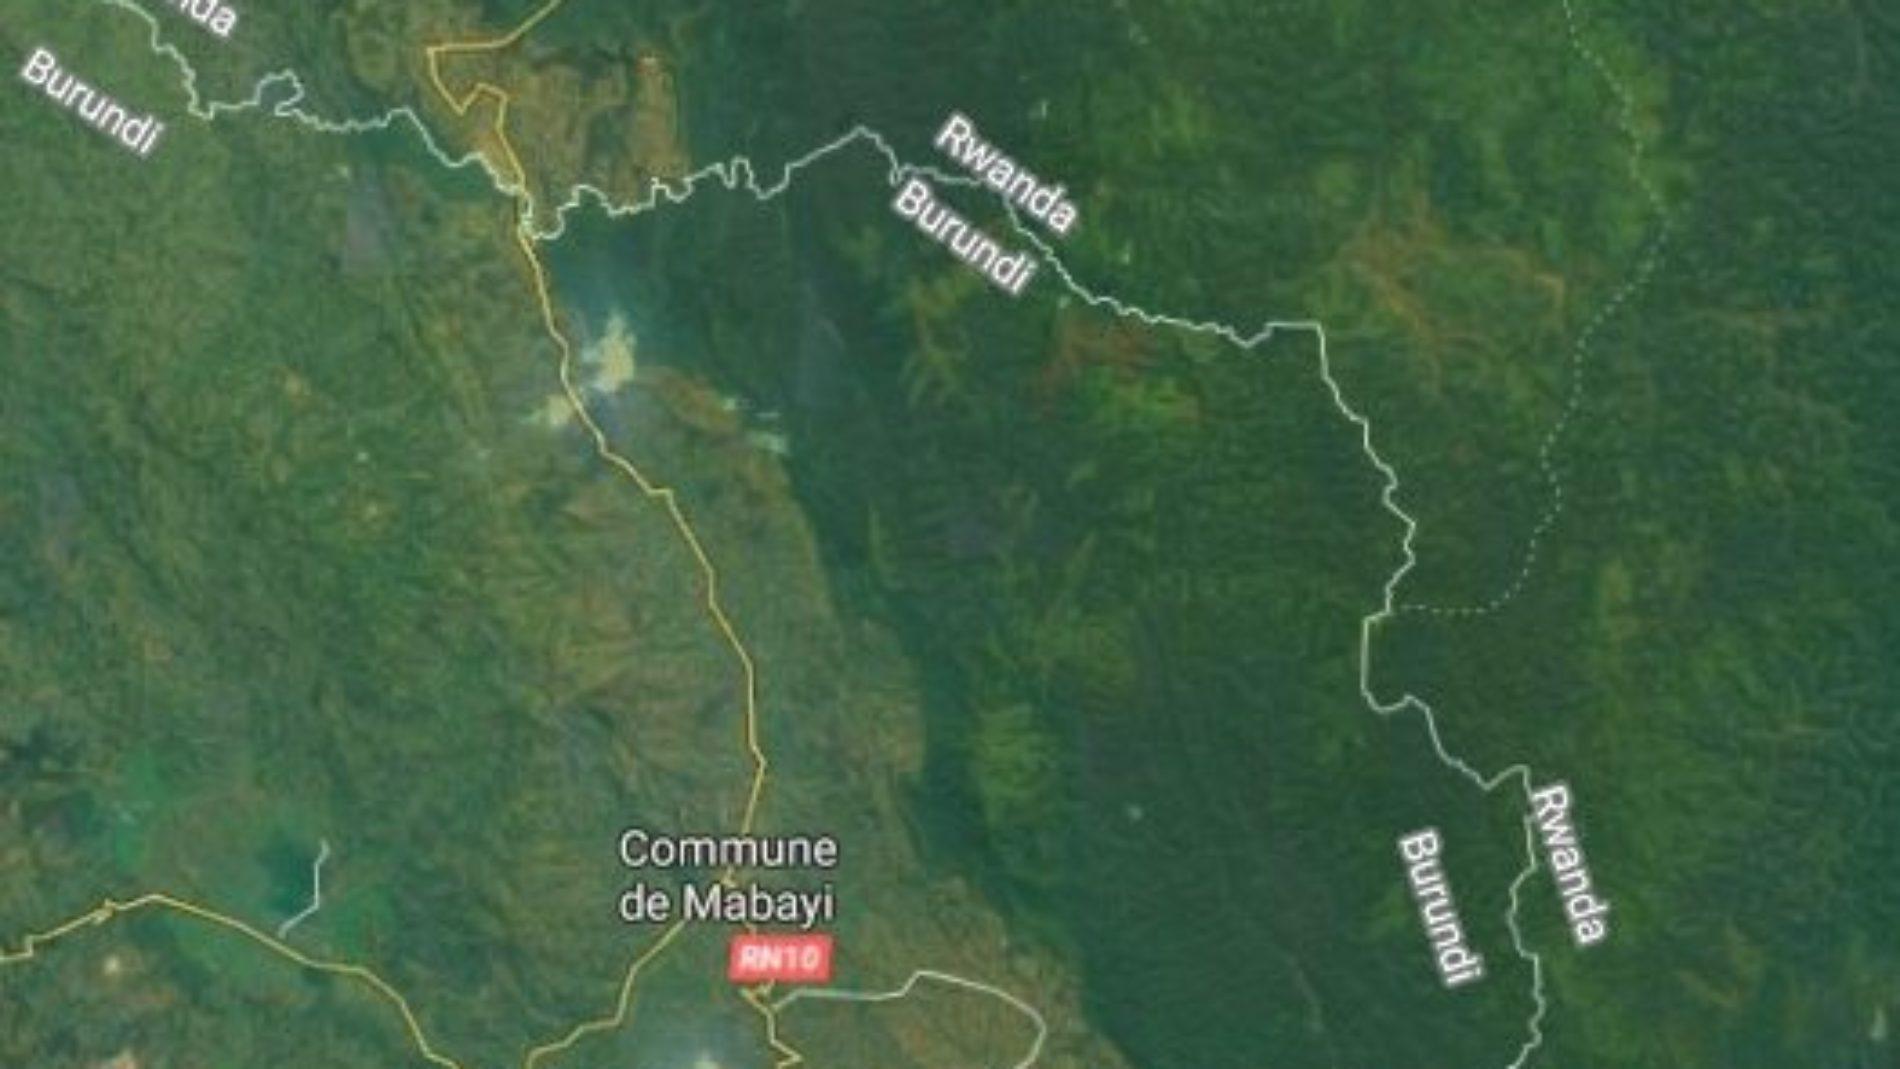 Un groupe armé a attaqué deux positions militaires de Mabayi (Cibitoke)